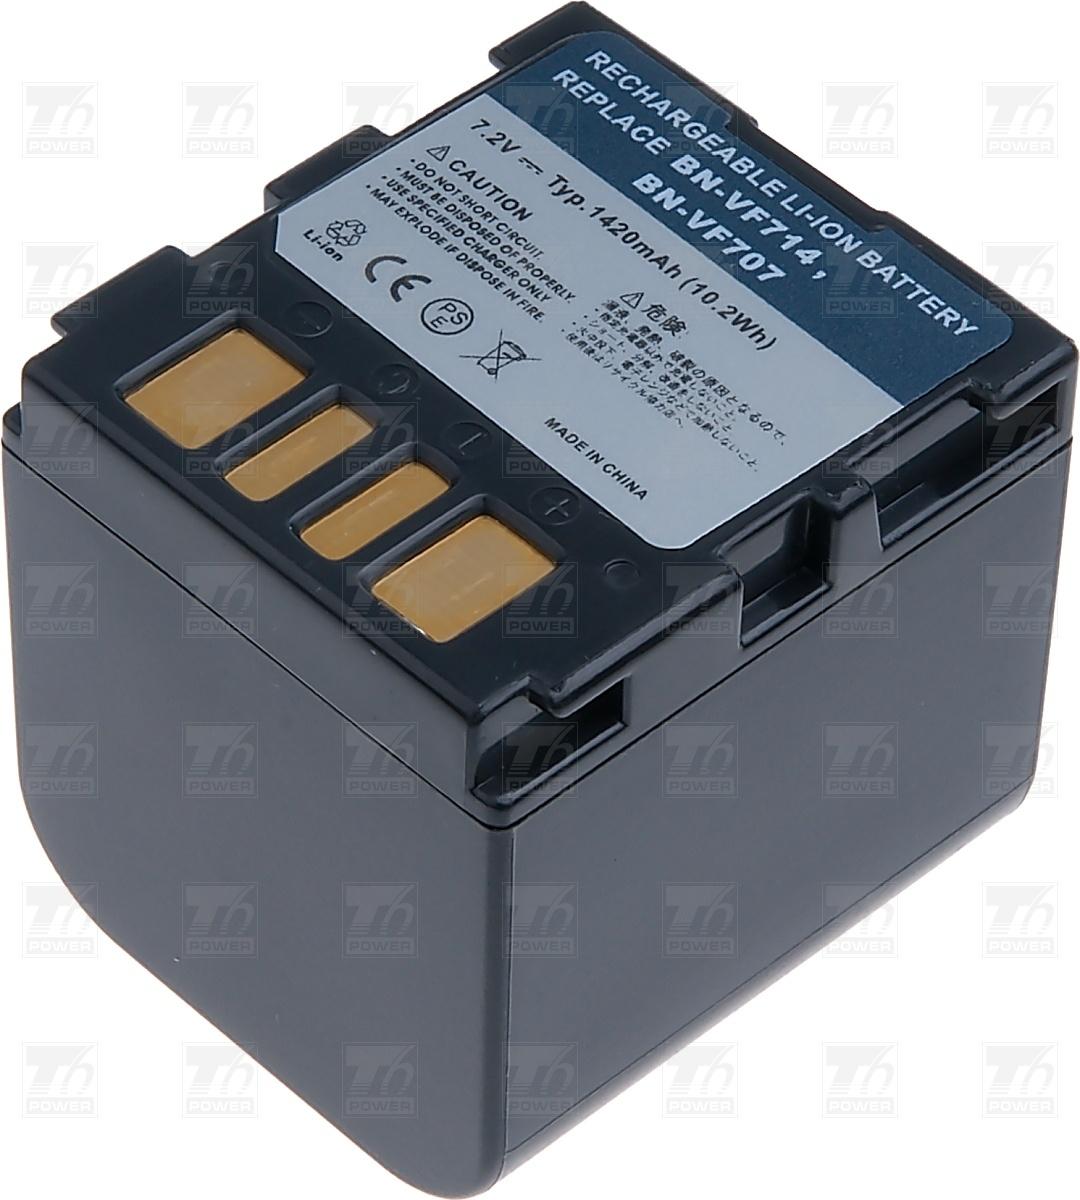 T6 power Baterie T6 power BN-VF707U, BN-VF707, BN-VF714, BN-VF70